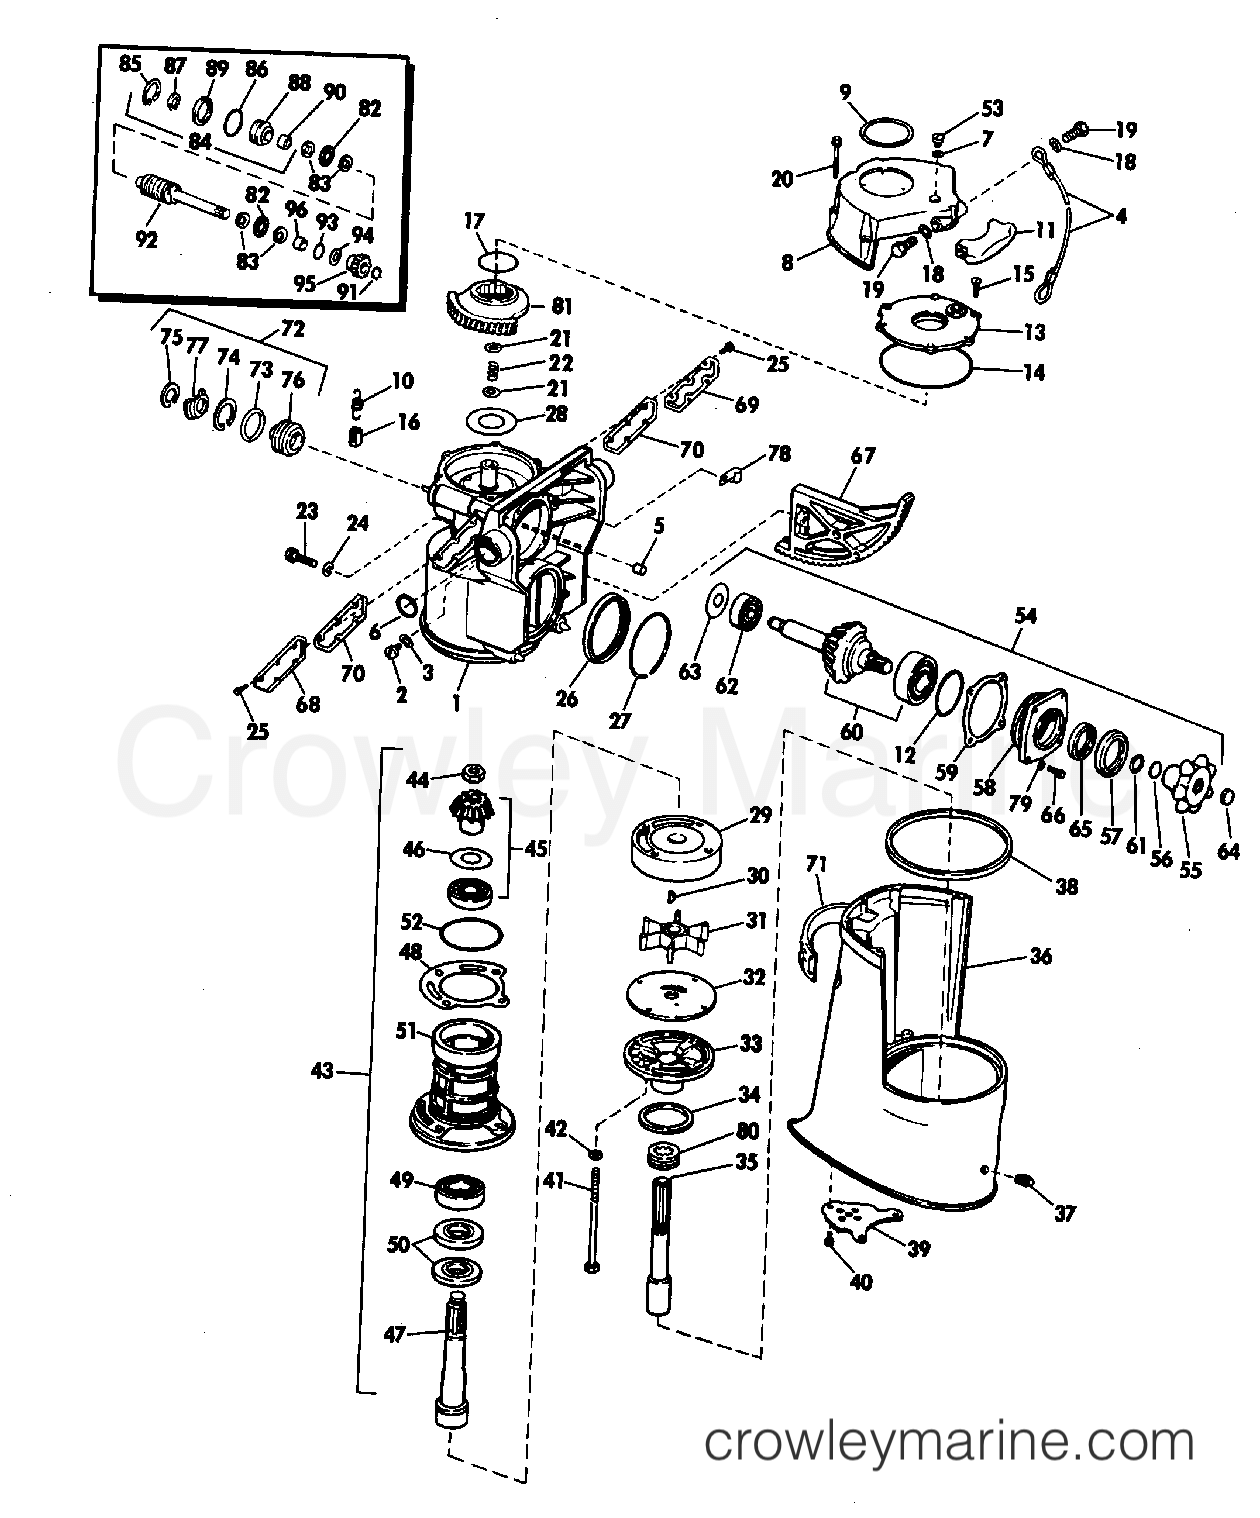 1972 OMC Stern Drive 225 - TUFM-21C - UPPER GEARCASE GROUP 155, 225